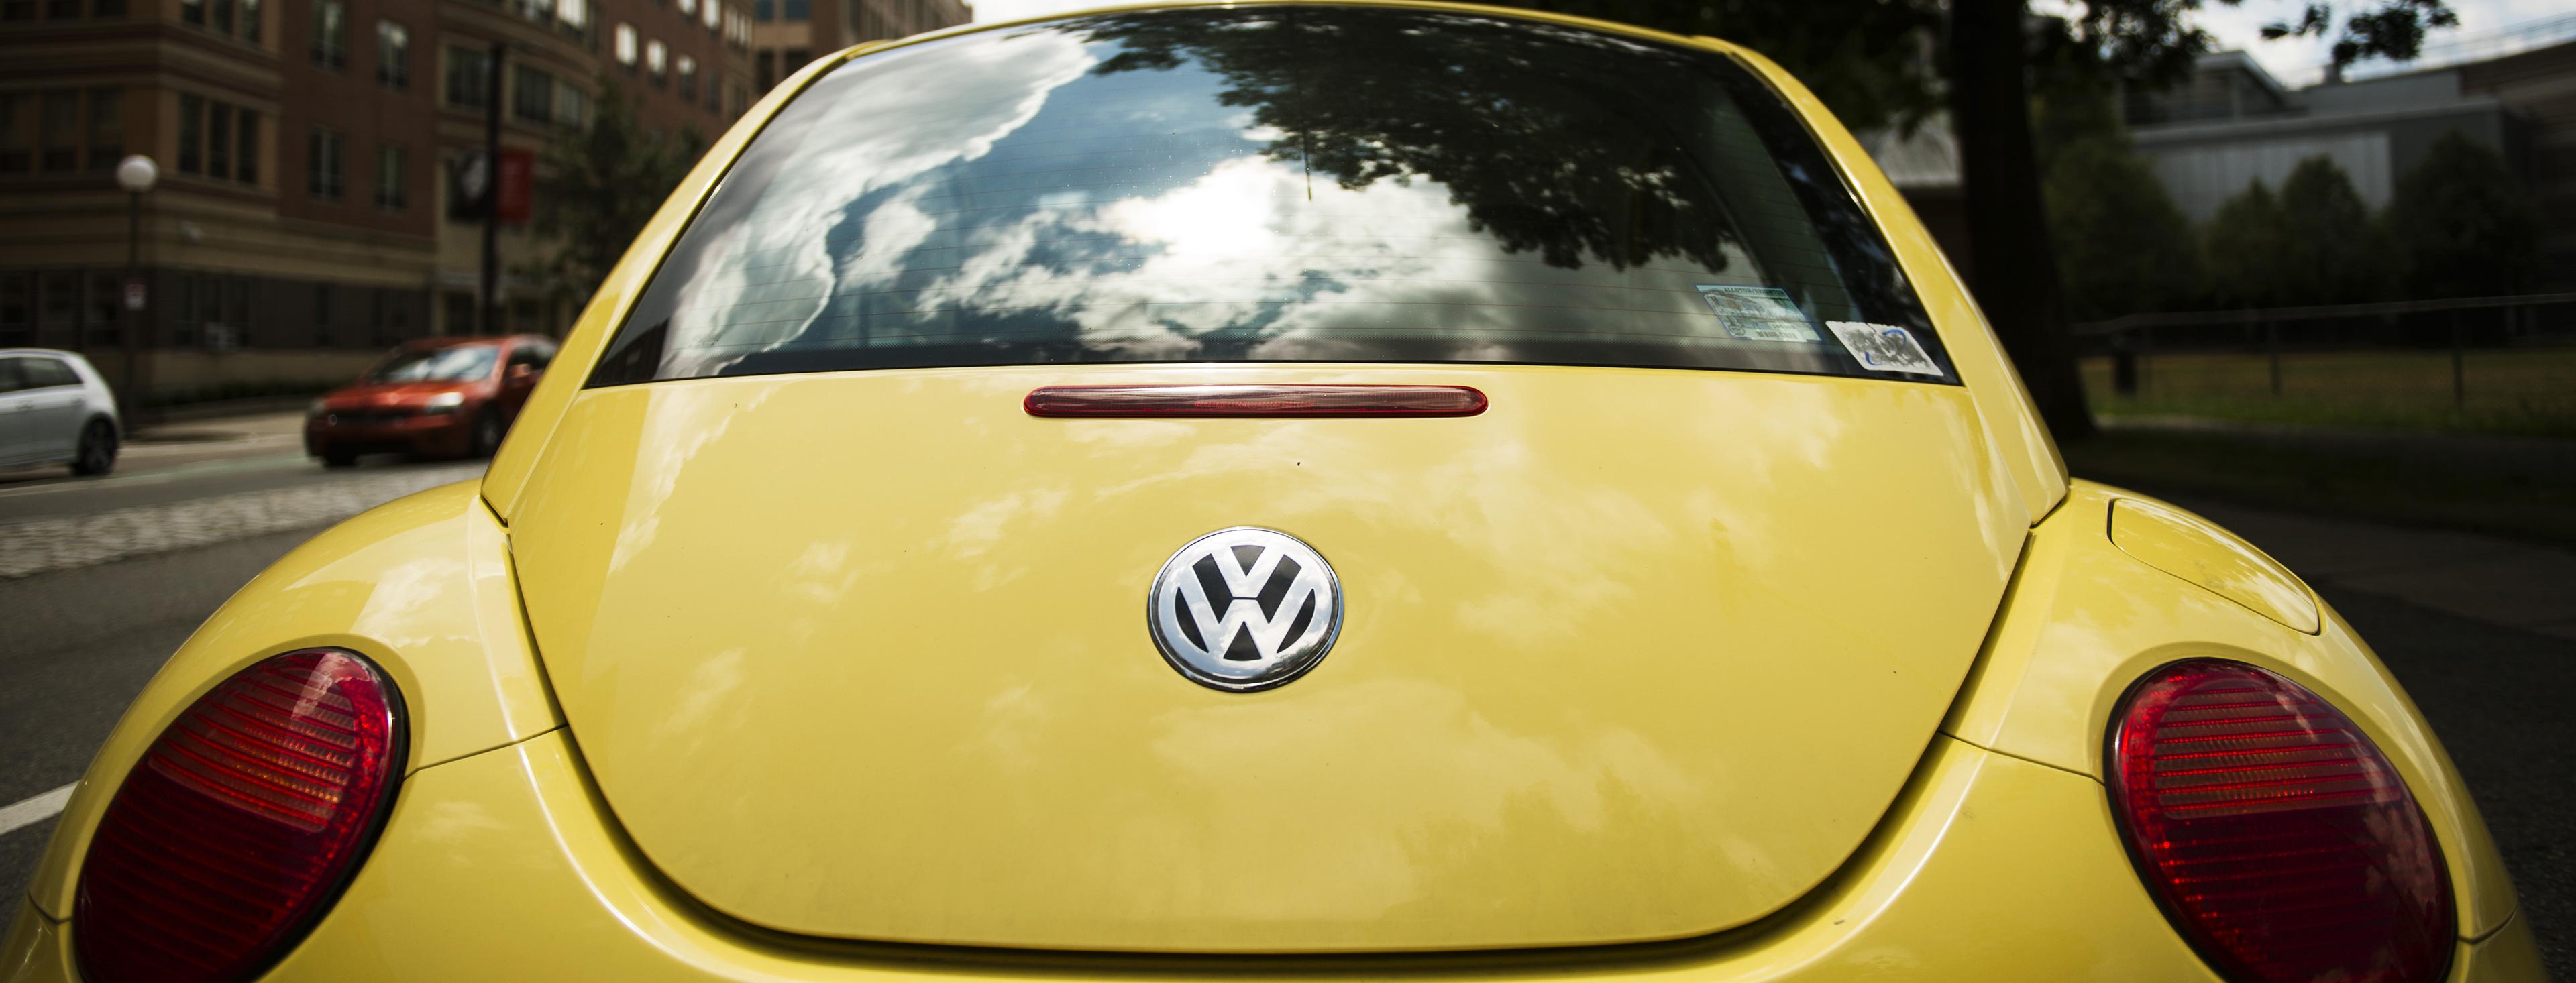 Volkswagen settlement in the USA